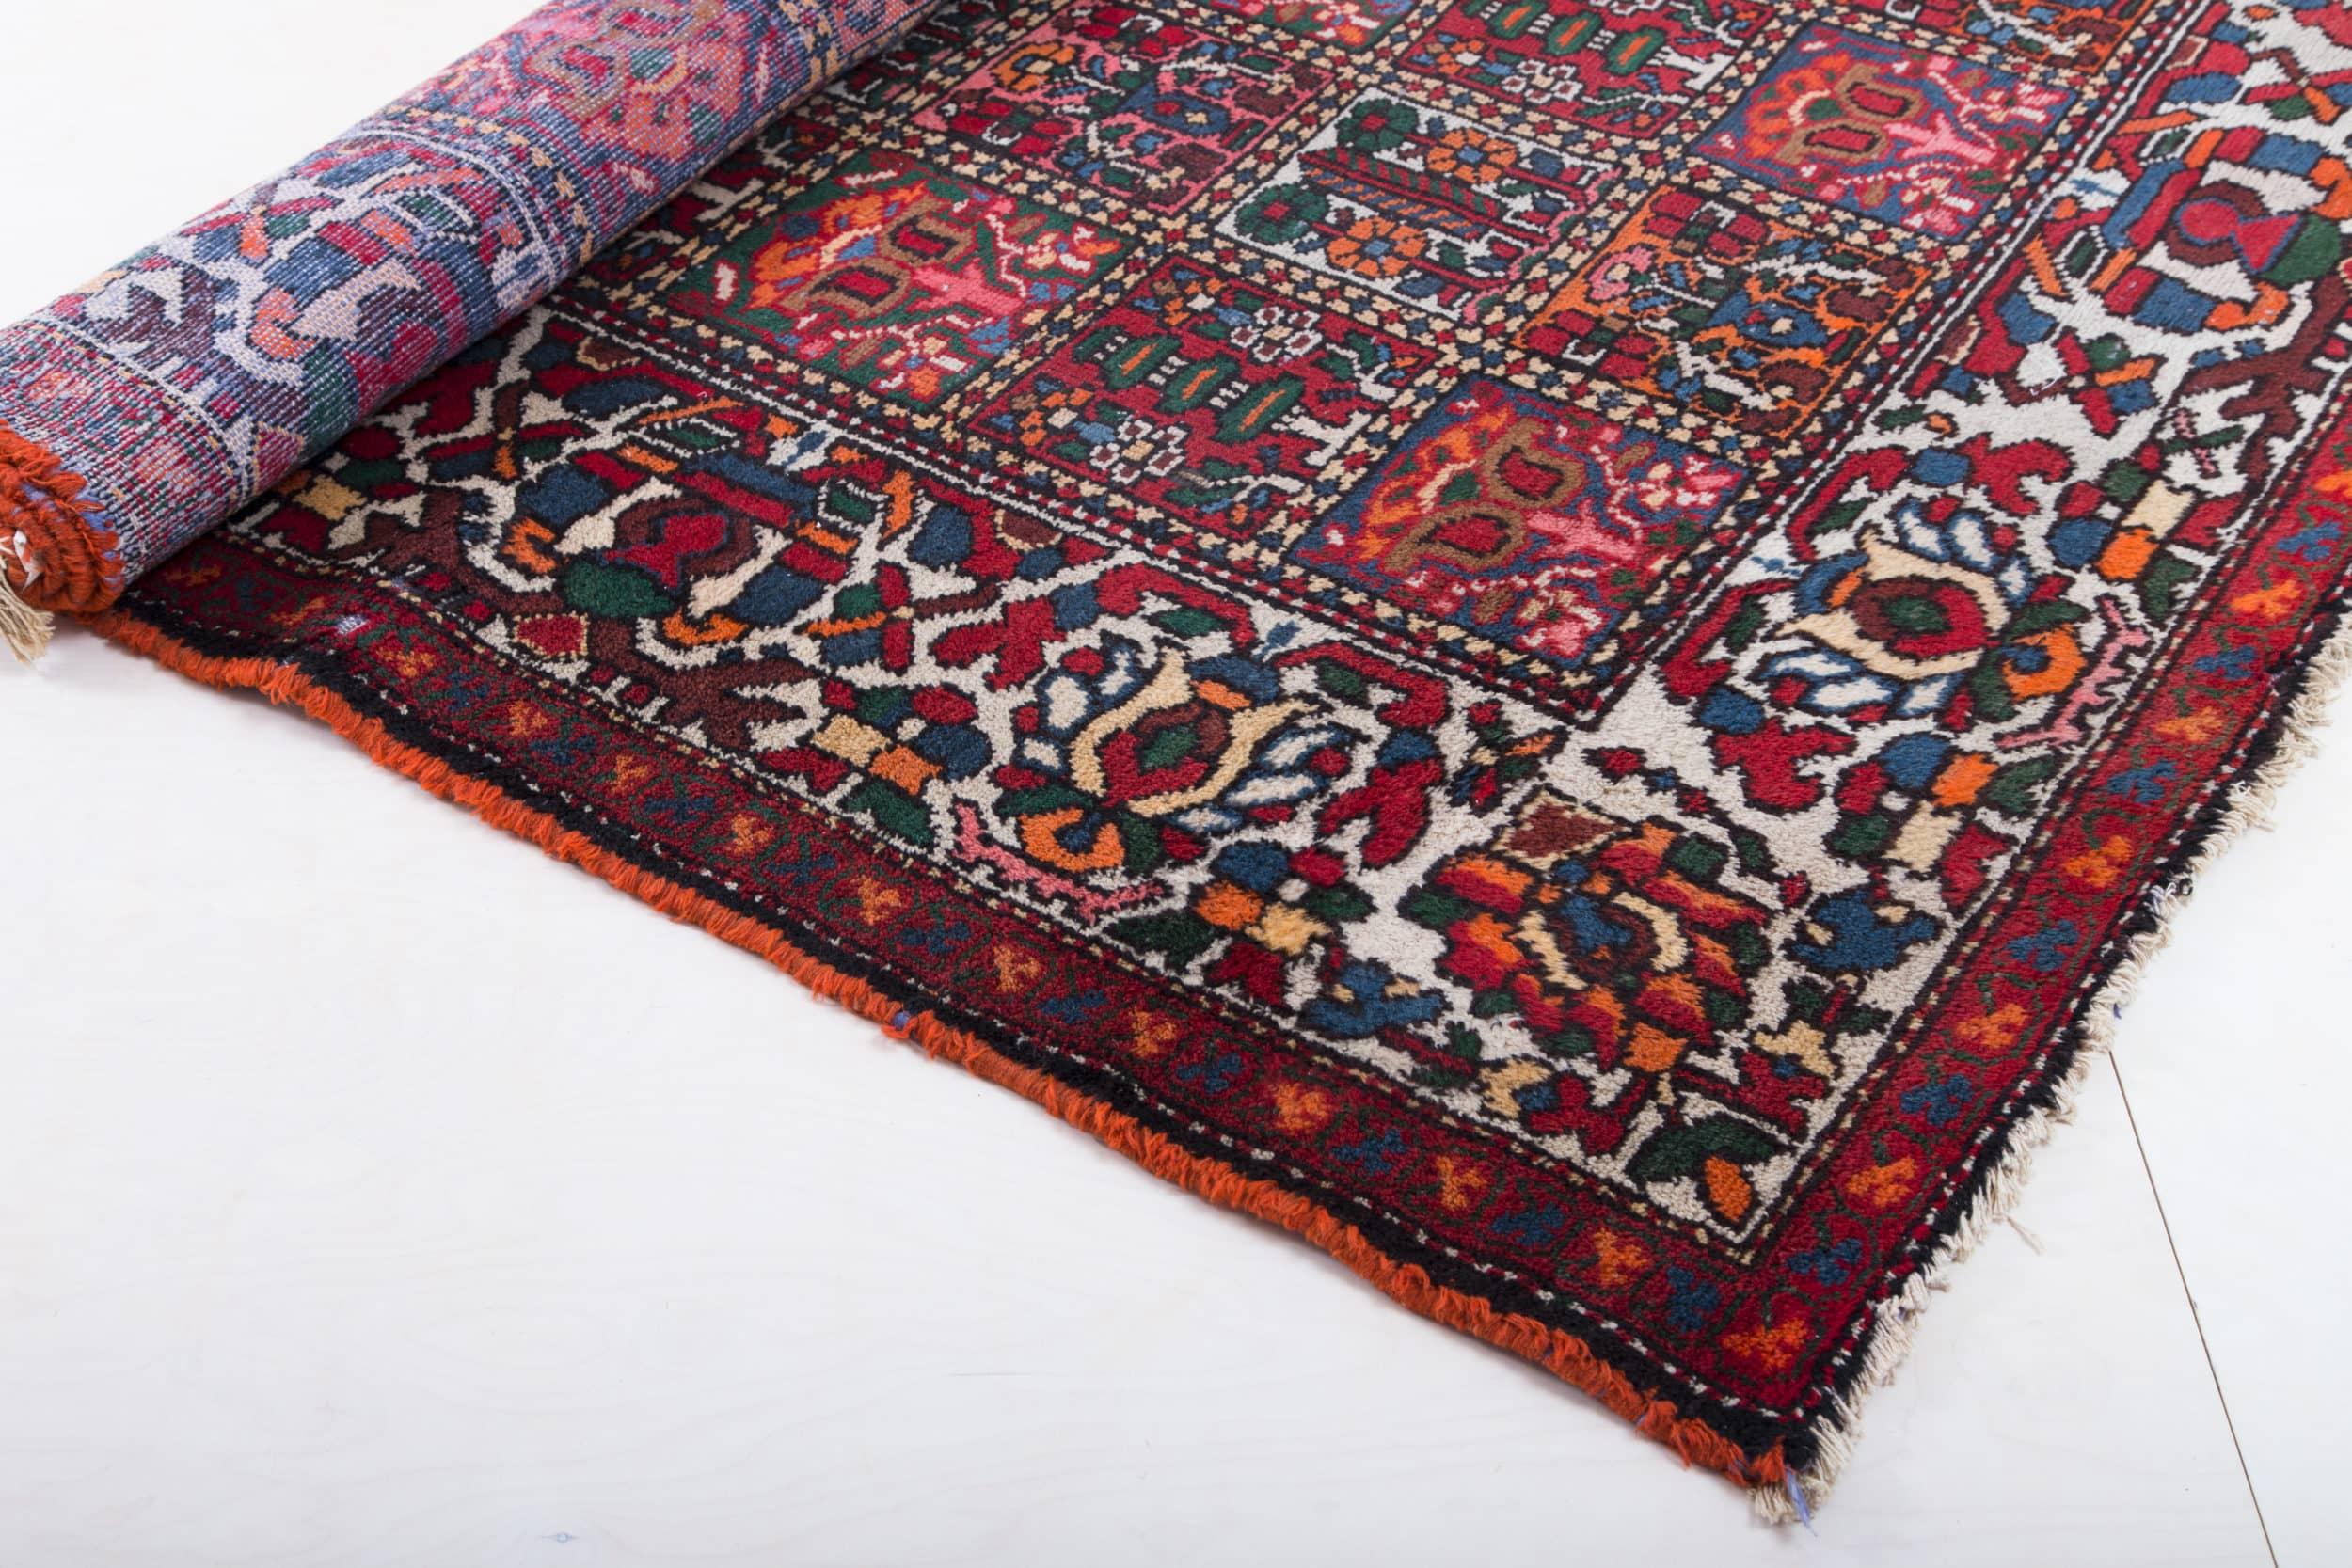 Teppiche mieten, Messestand Dekoration